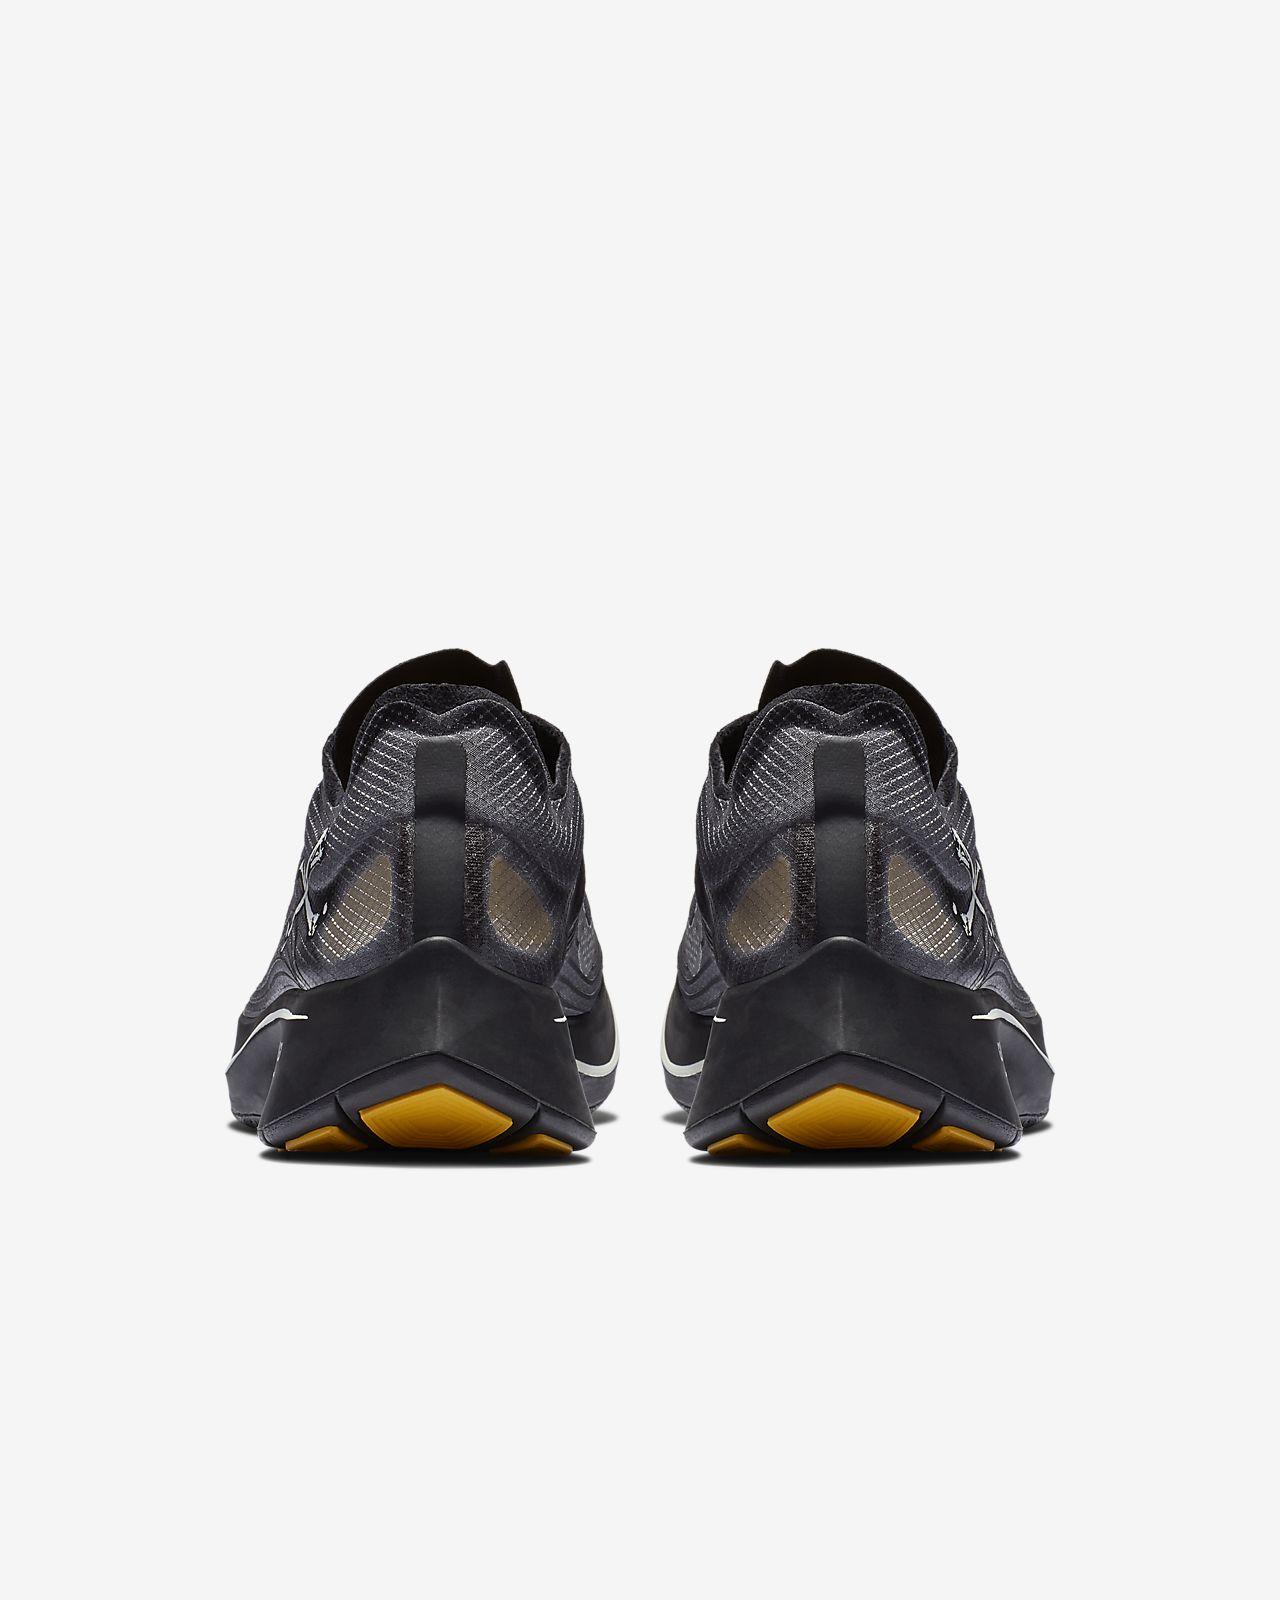 new style 168a0 e9da3 ... ebay nike x gyakusou zoom fly running shoe 8515a f49c9